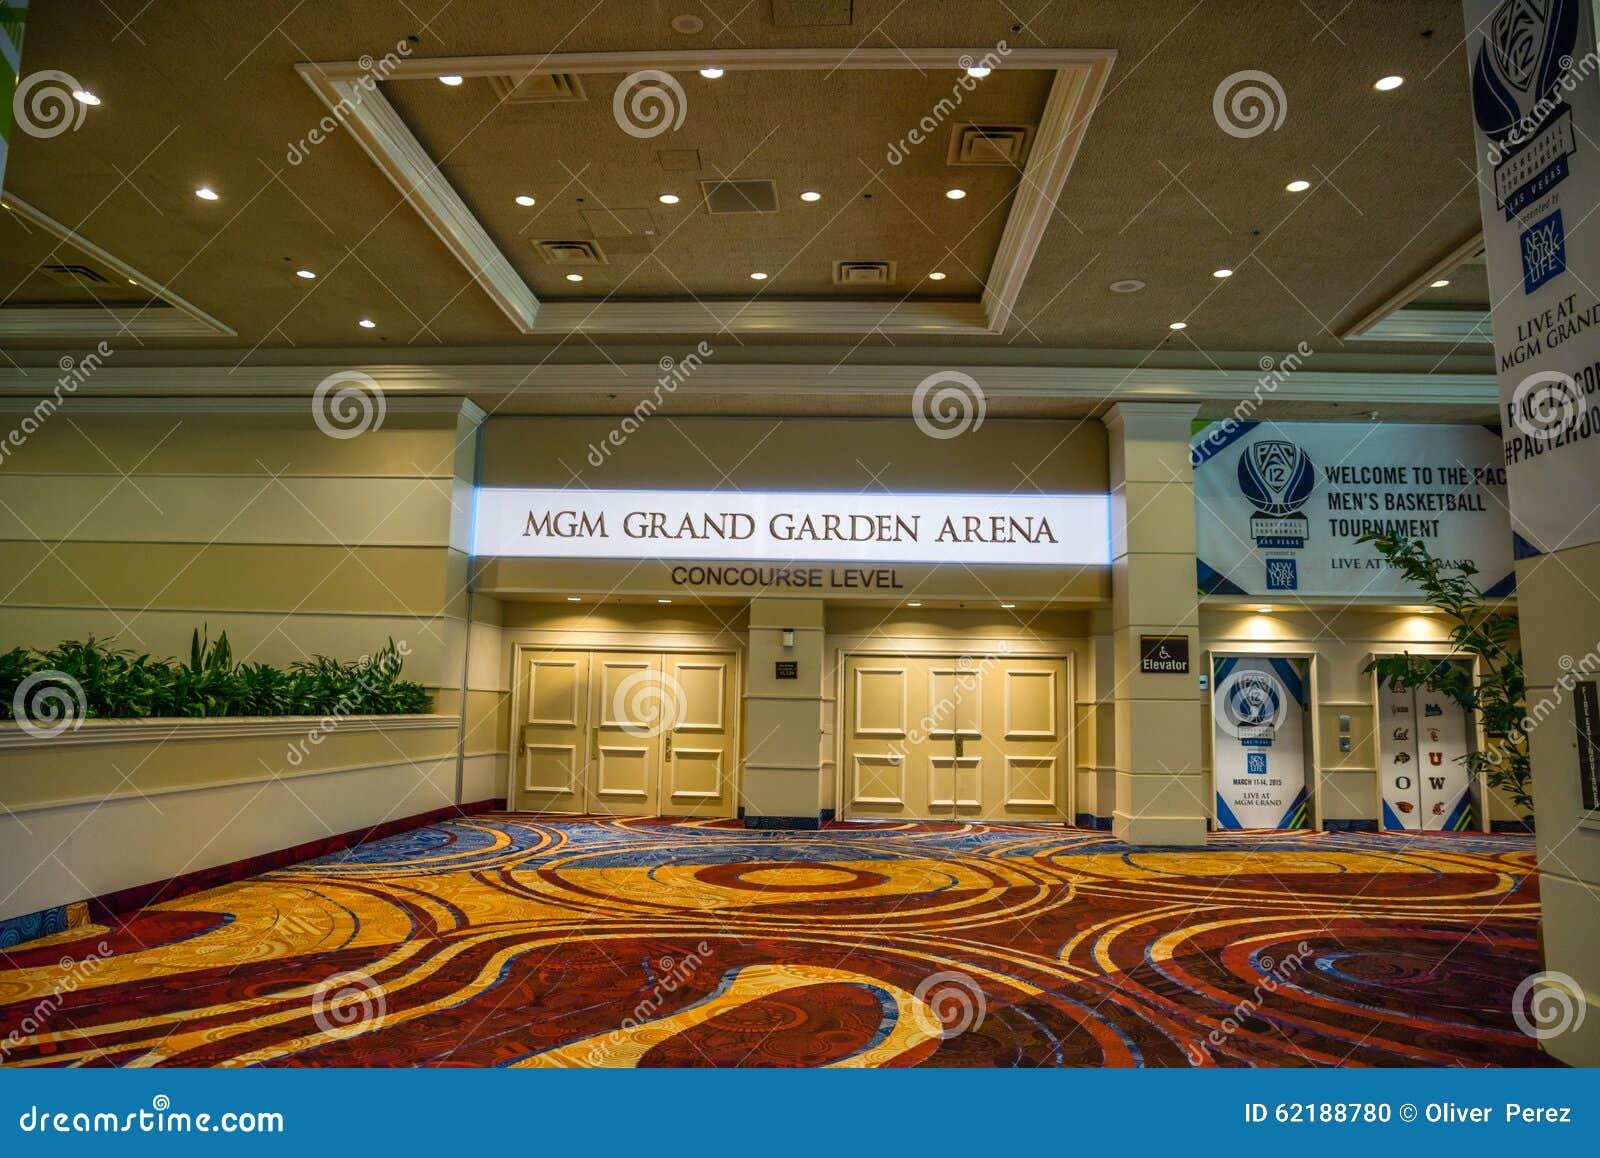 MGM Grand Garden Arena editorial image. Image of basketball - 62188780